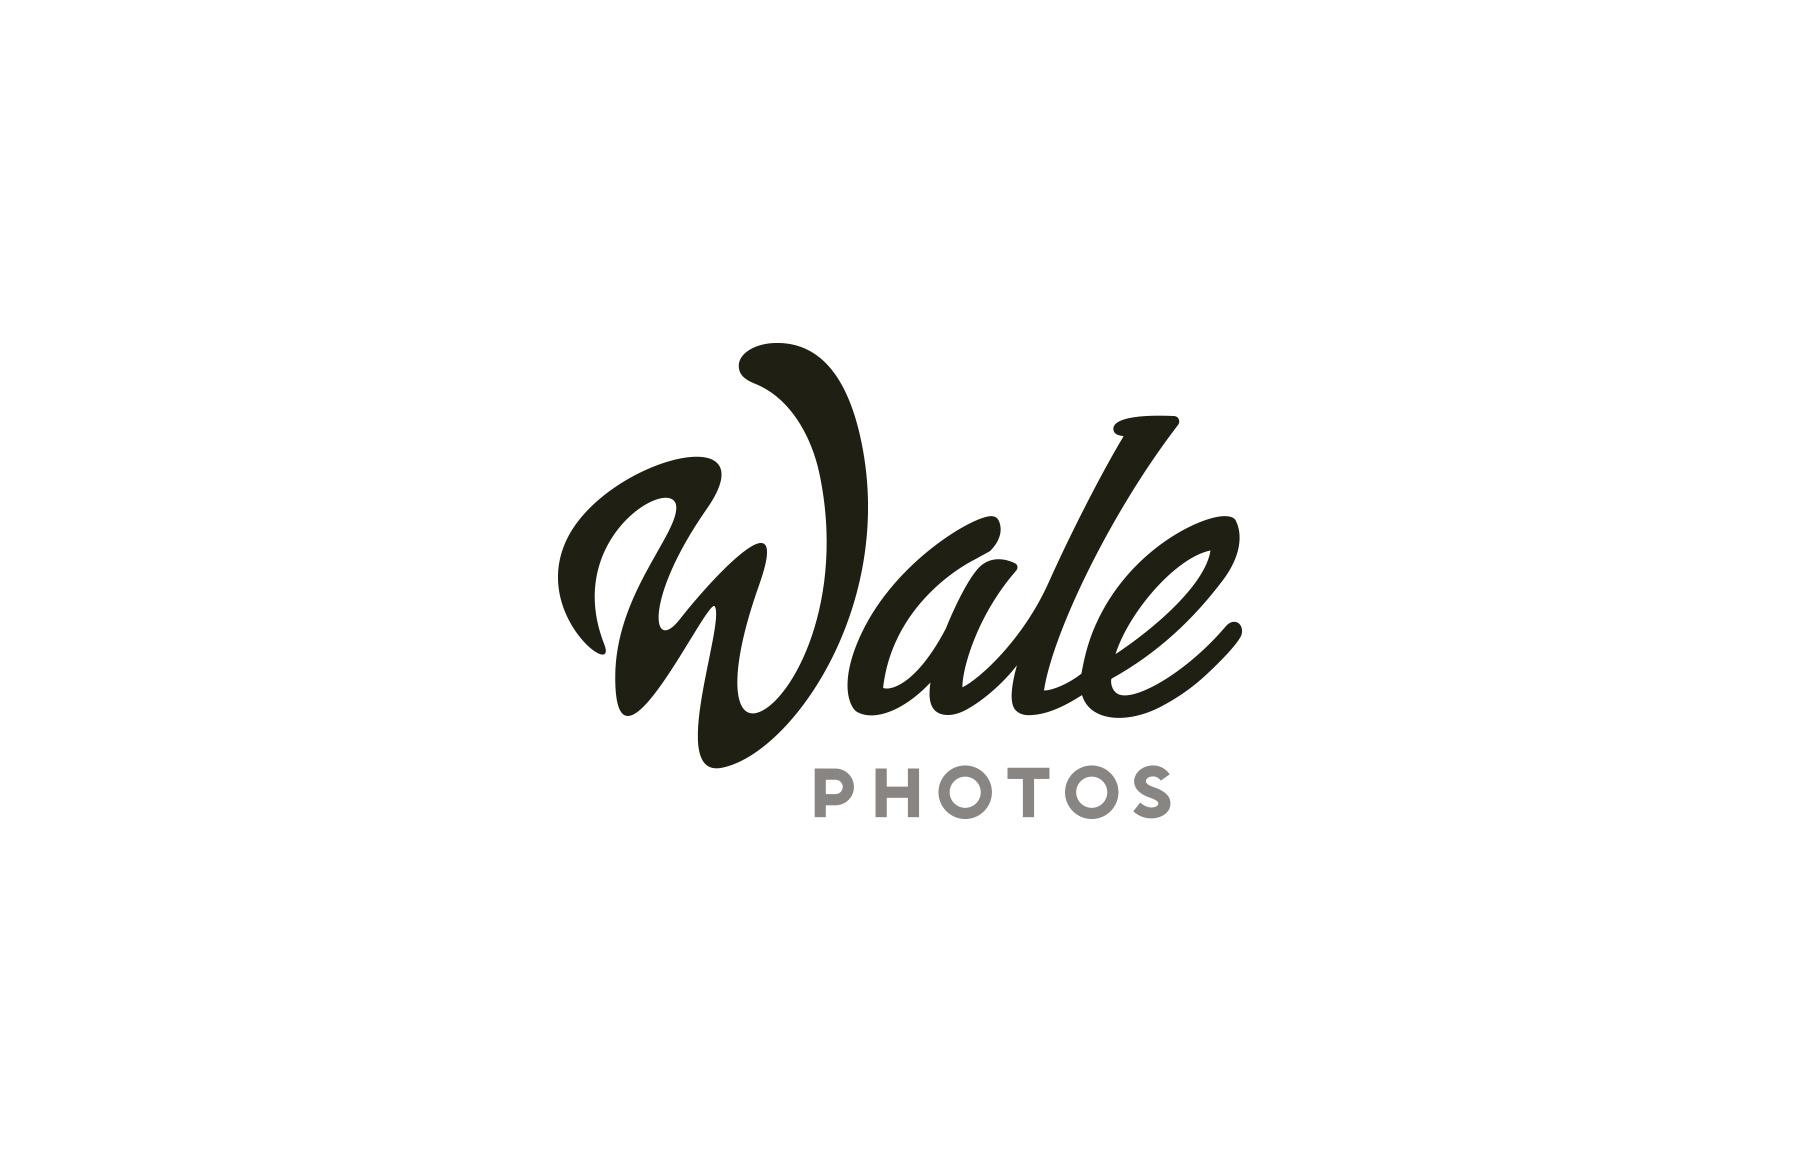 joshua_berman_design_brand_identity_logo_custom lettering_wale ariztos.jpg